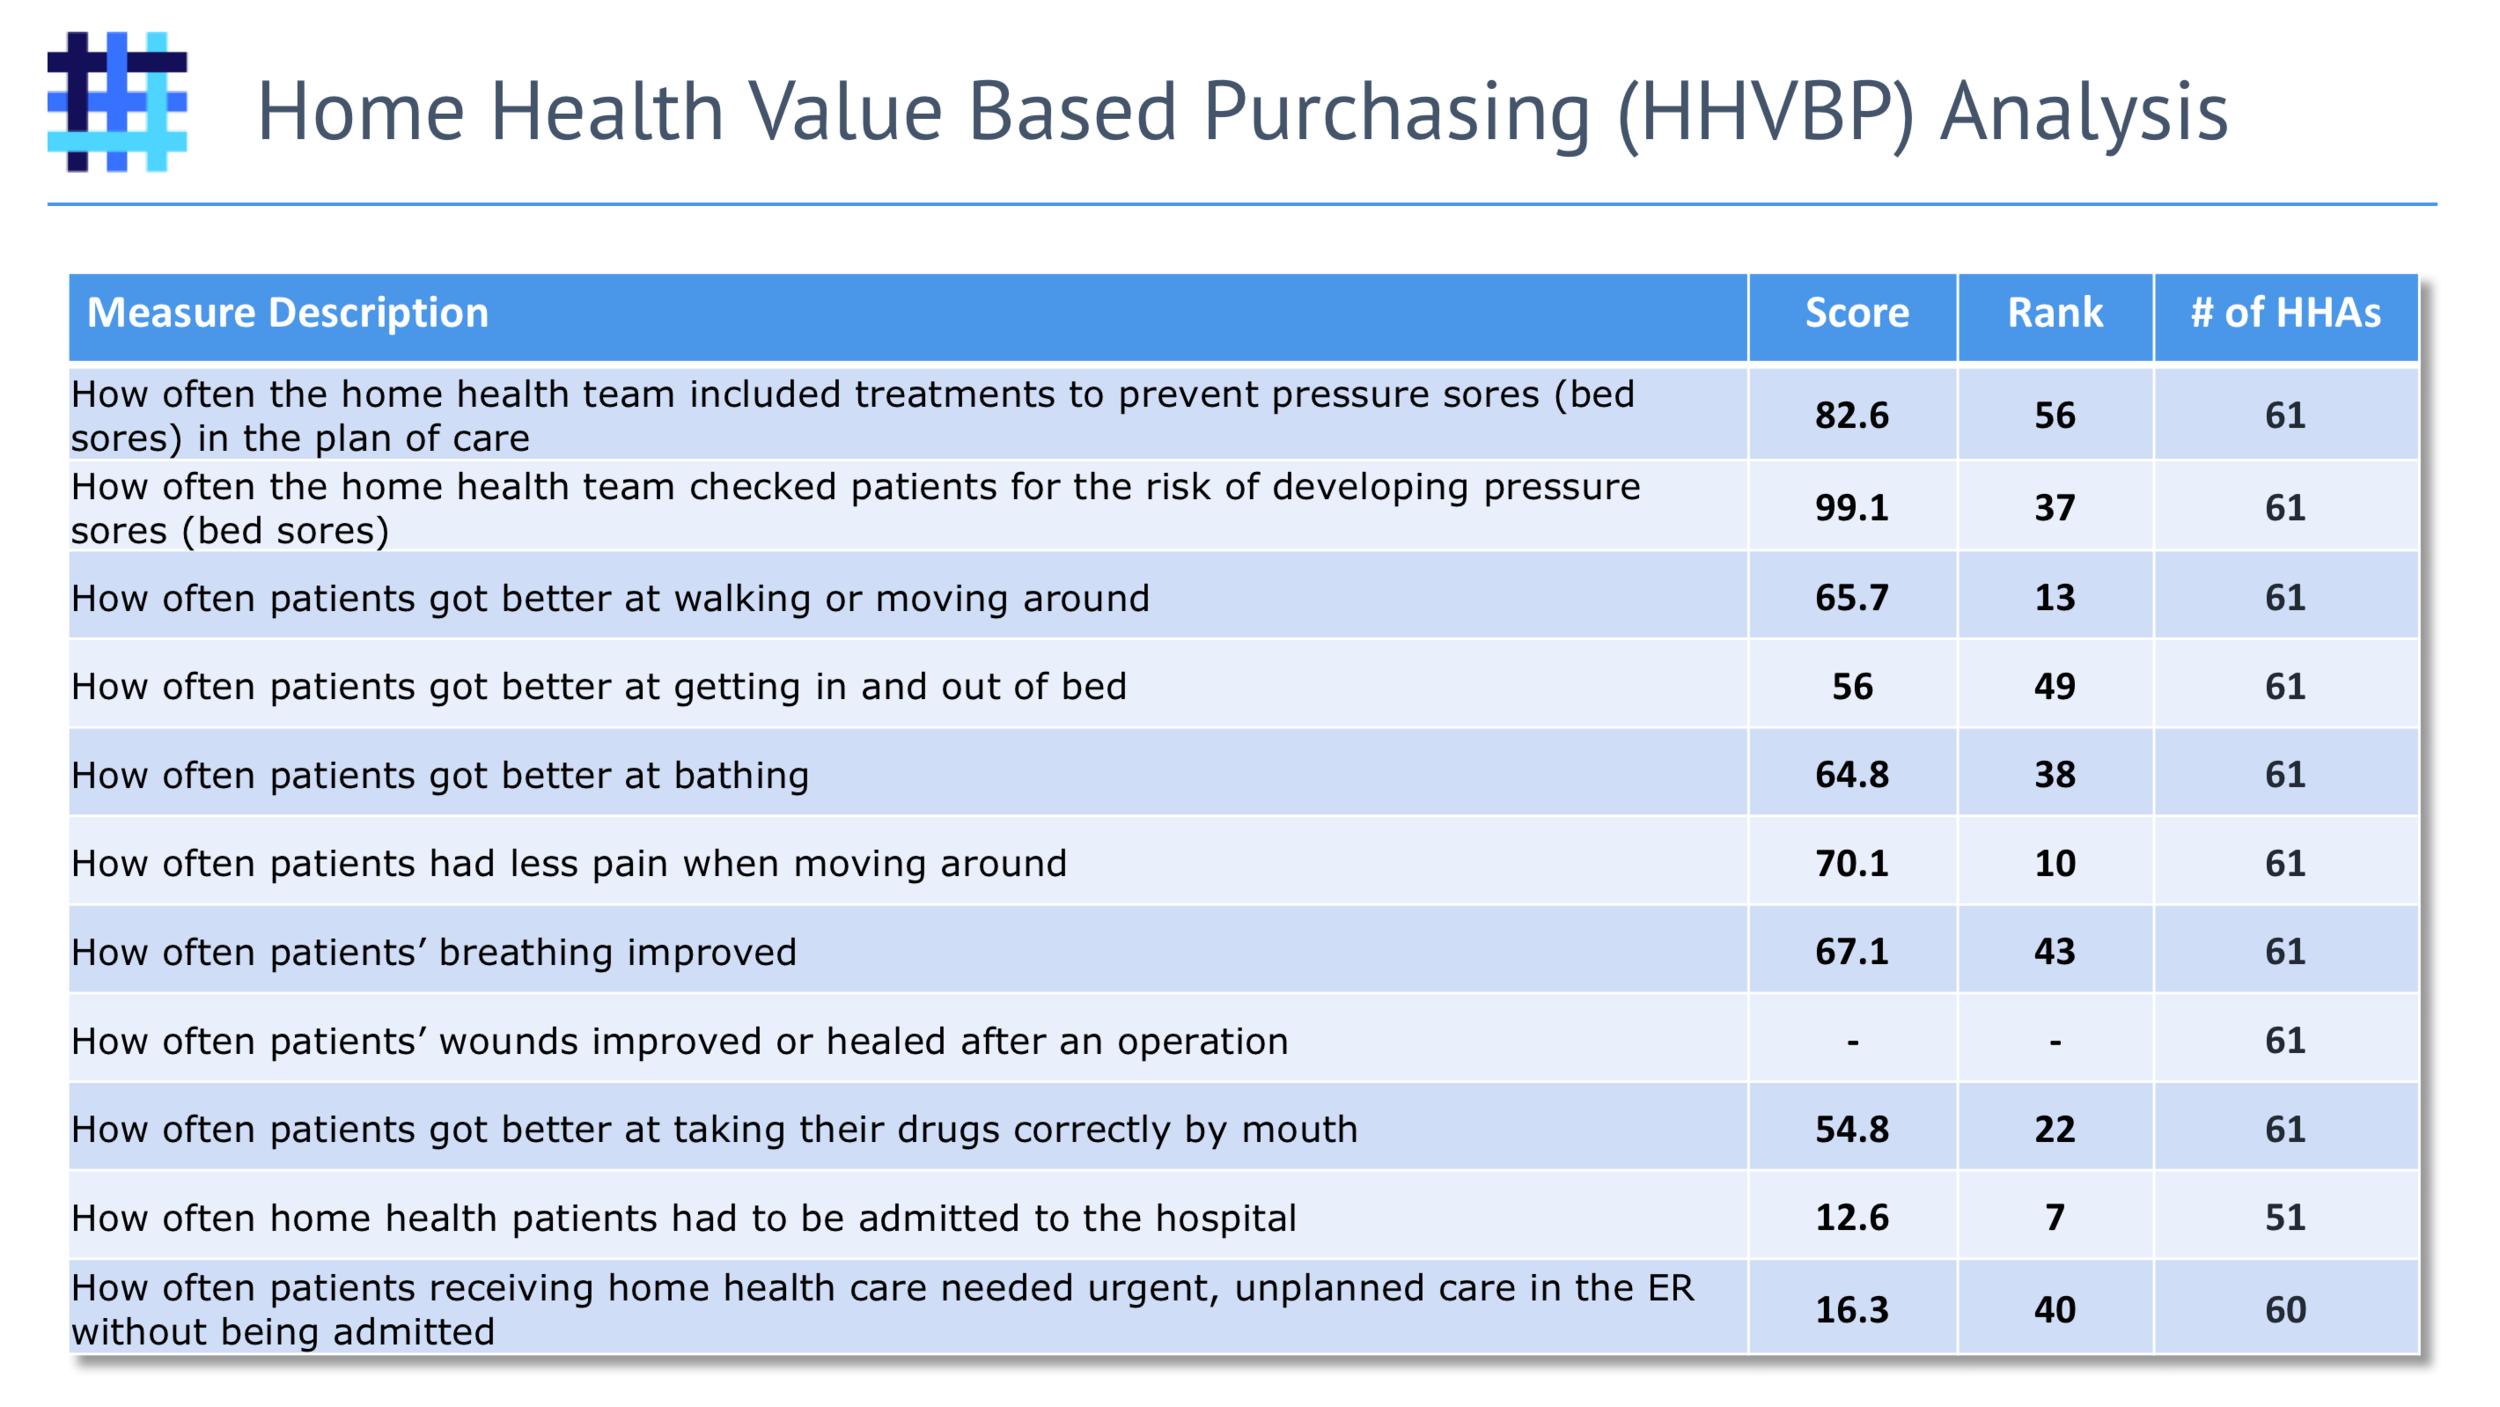 web-hha-medicare-home-health-value-based-purchasing-hhvbp-2.png